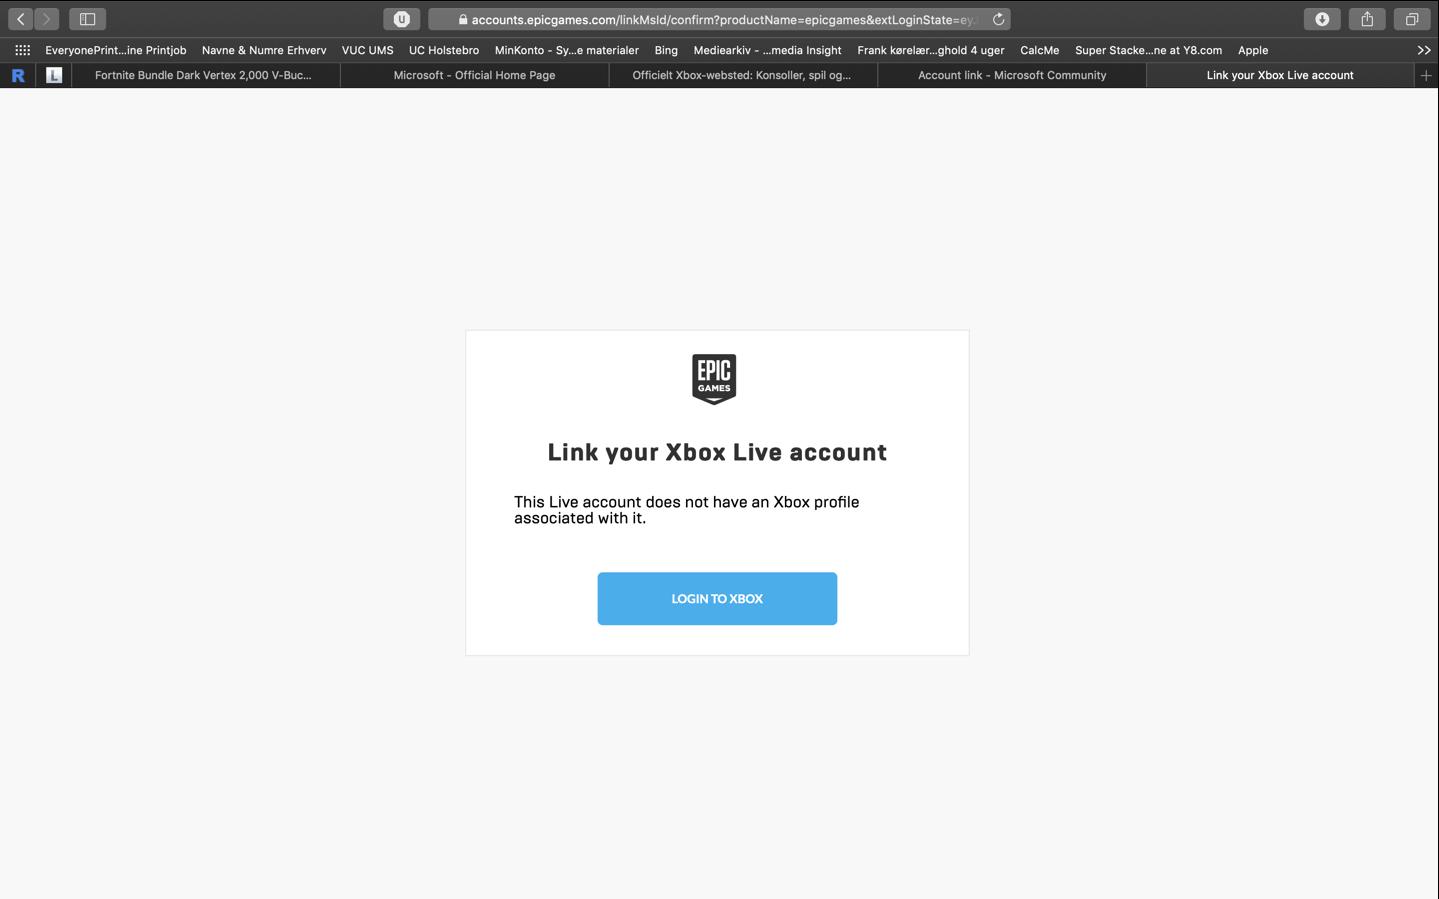 Account link - Microsoft Community